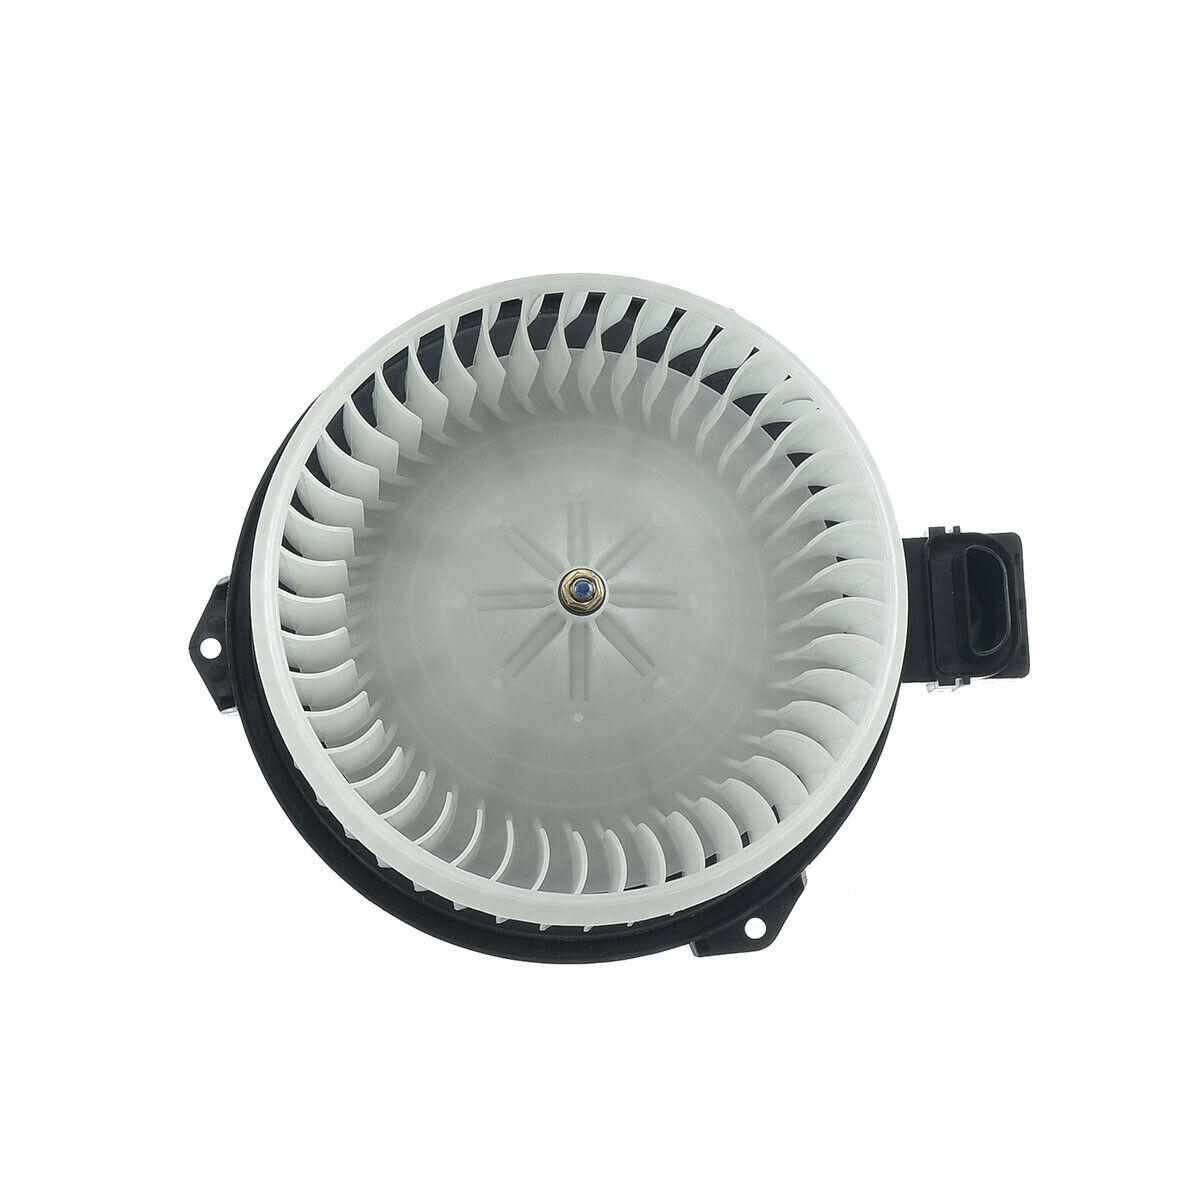 HVAC Blower Motor w// FanCage Front for 2012-2013 Dodge Journey 5191743AB 700305